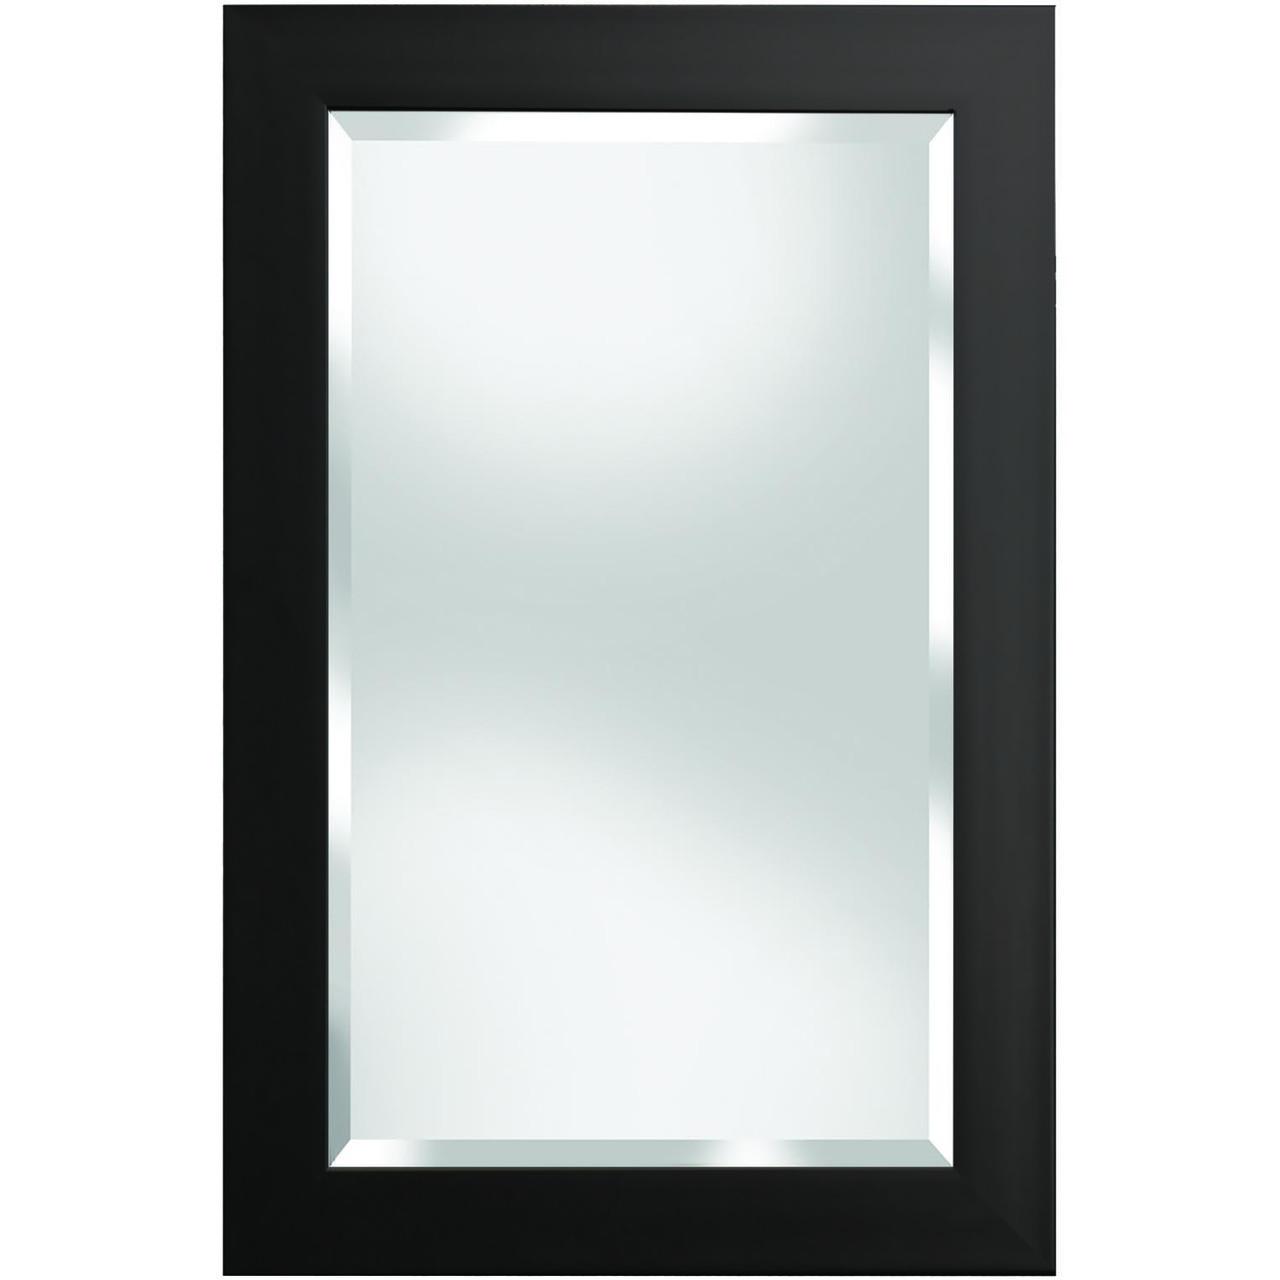 Austin Black Framed Mirror - Renin